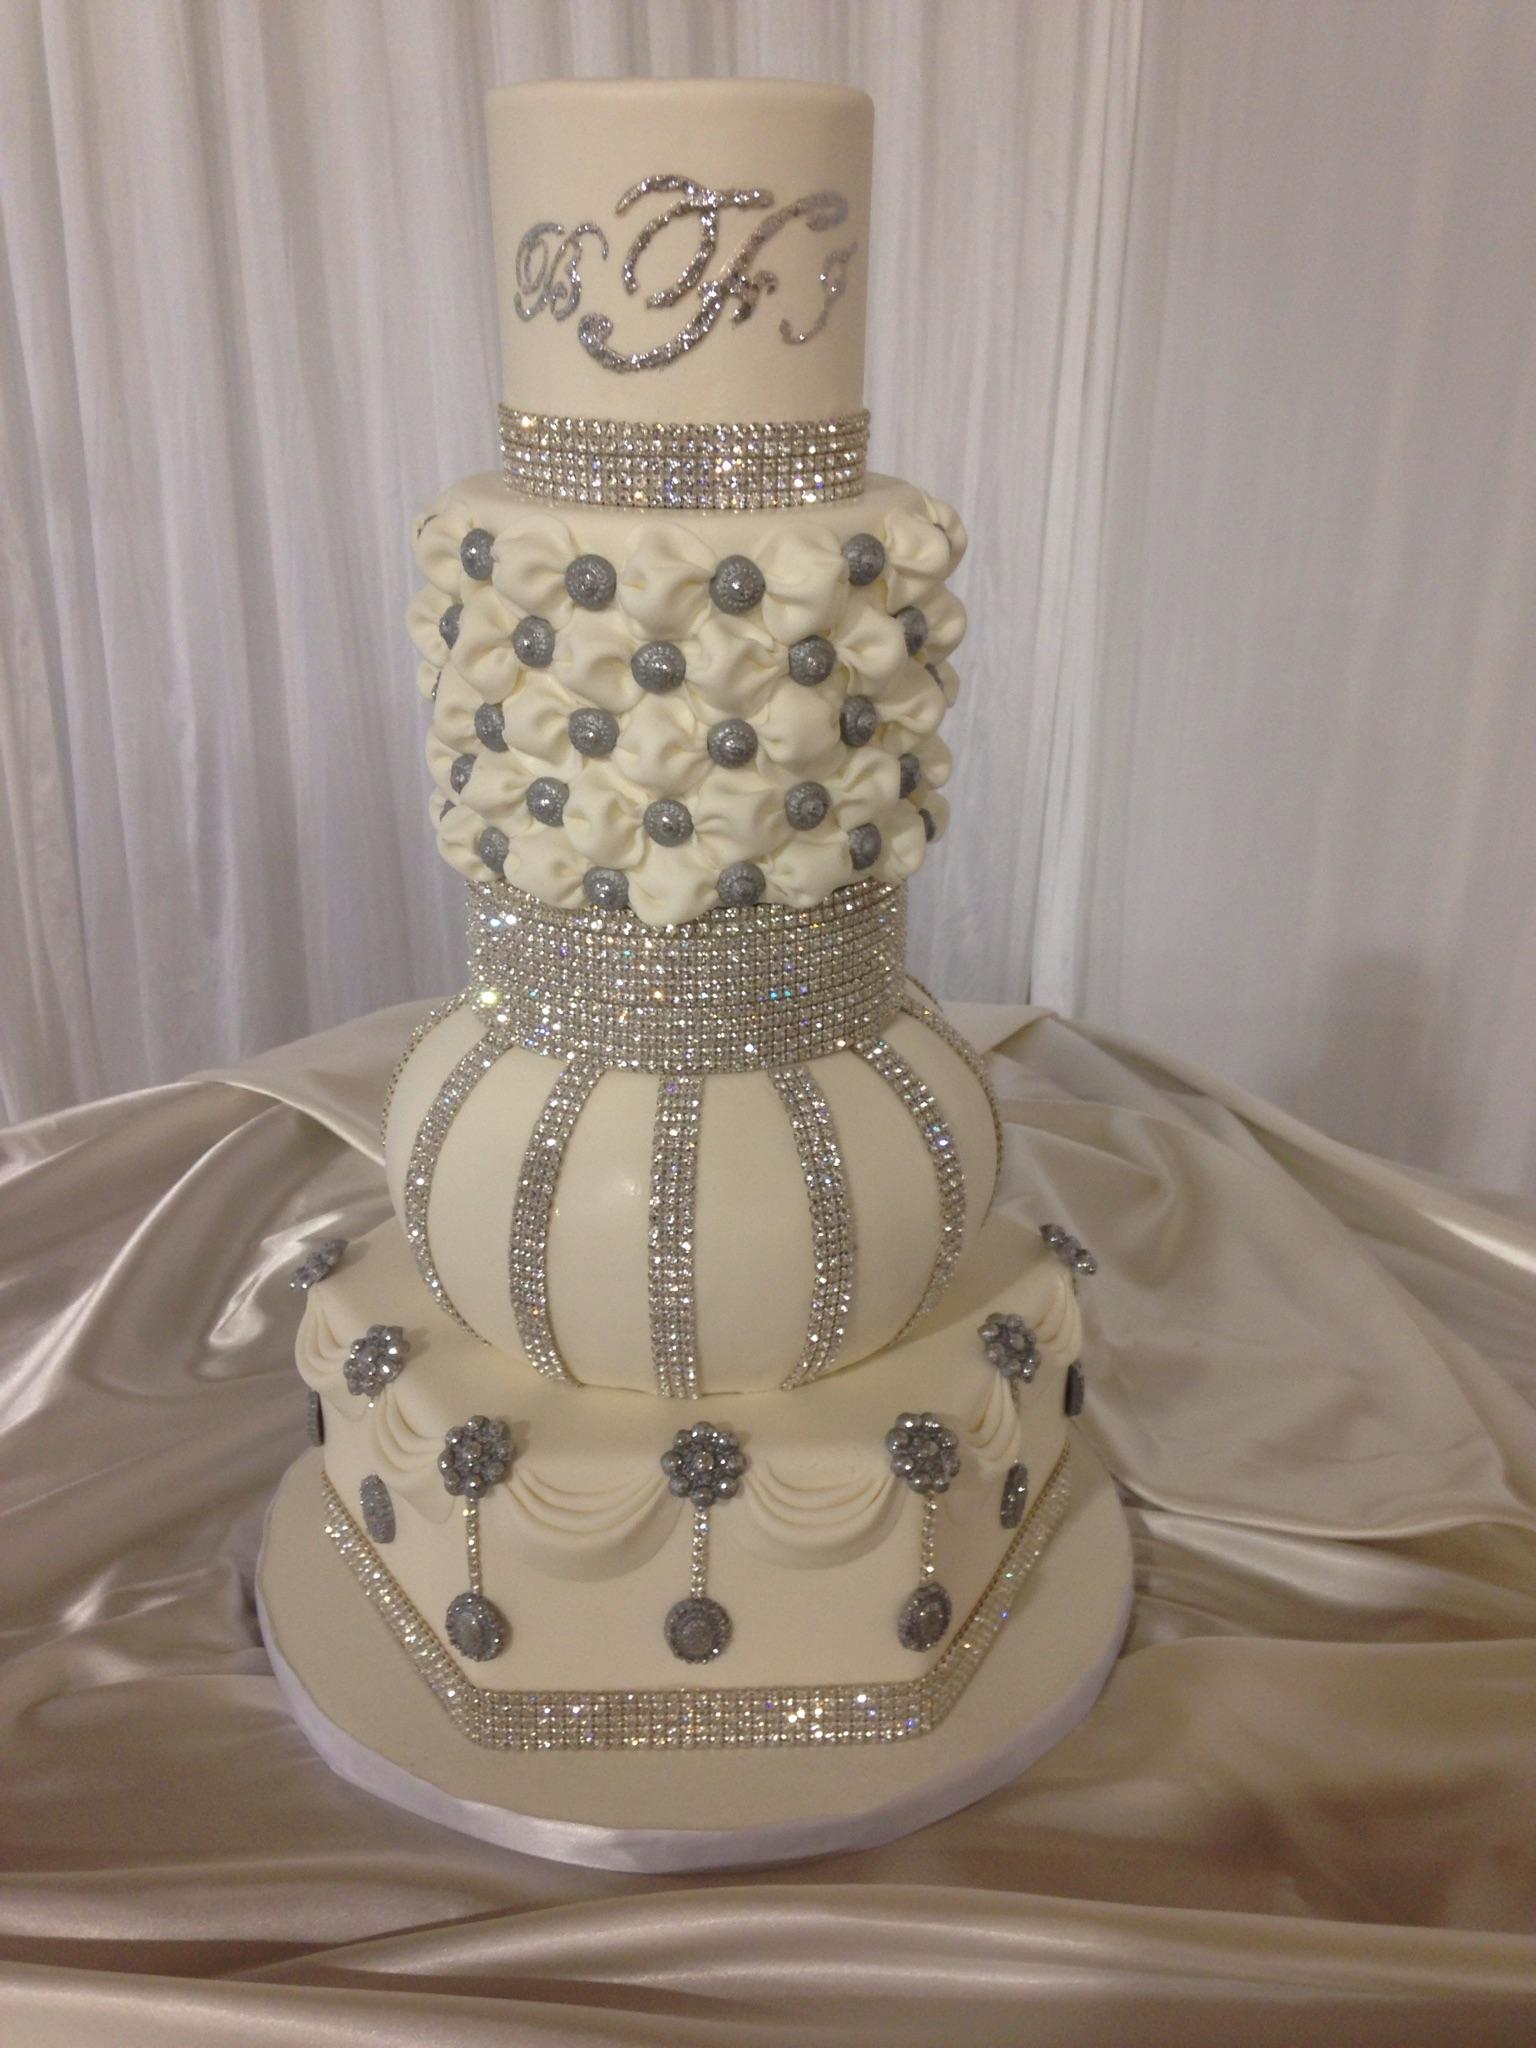 Cake 8 - Gardenia's Custom Cakes & Catering.jpg